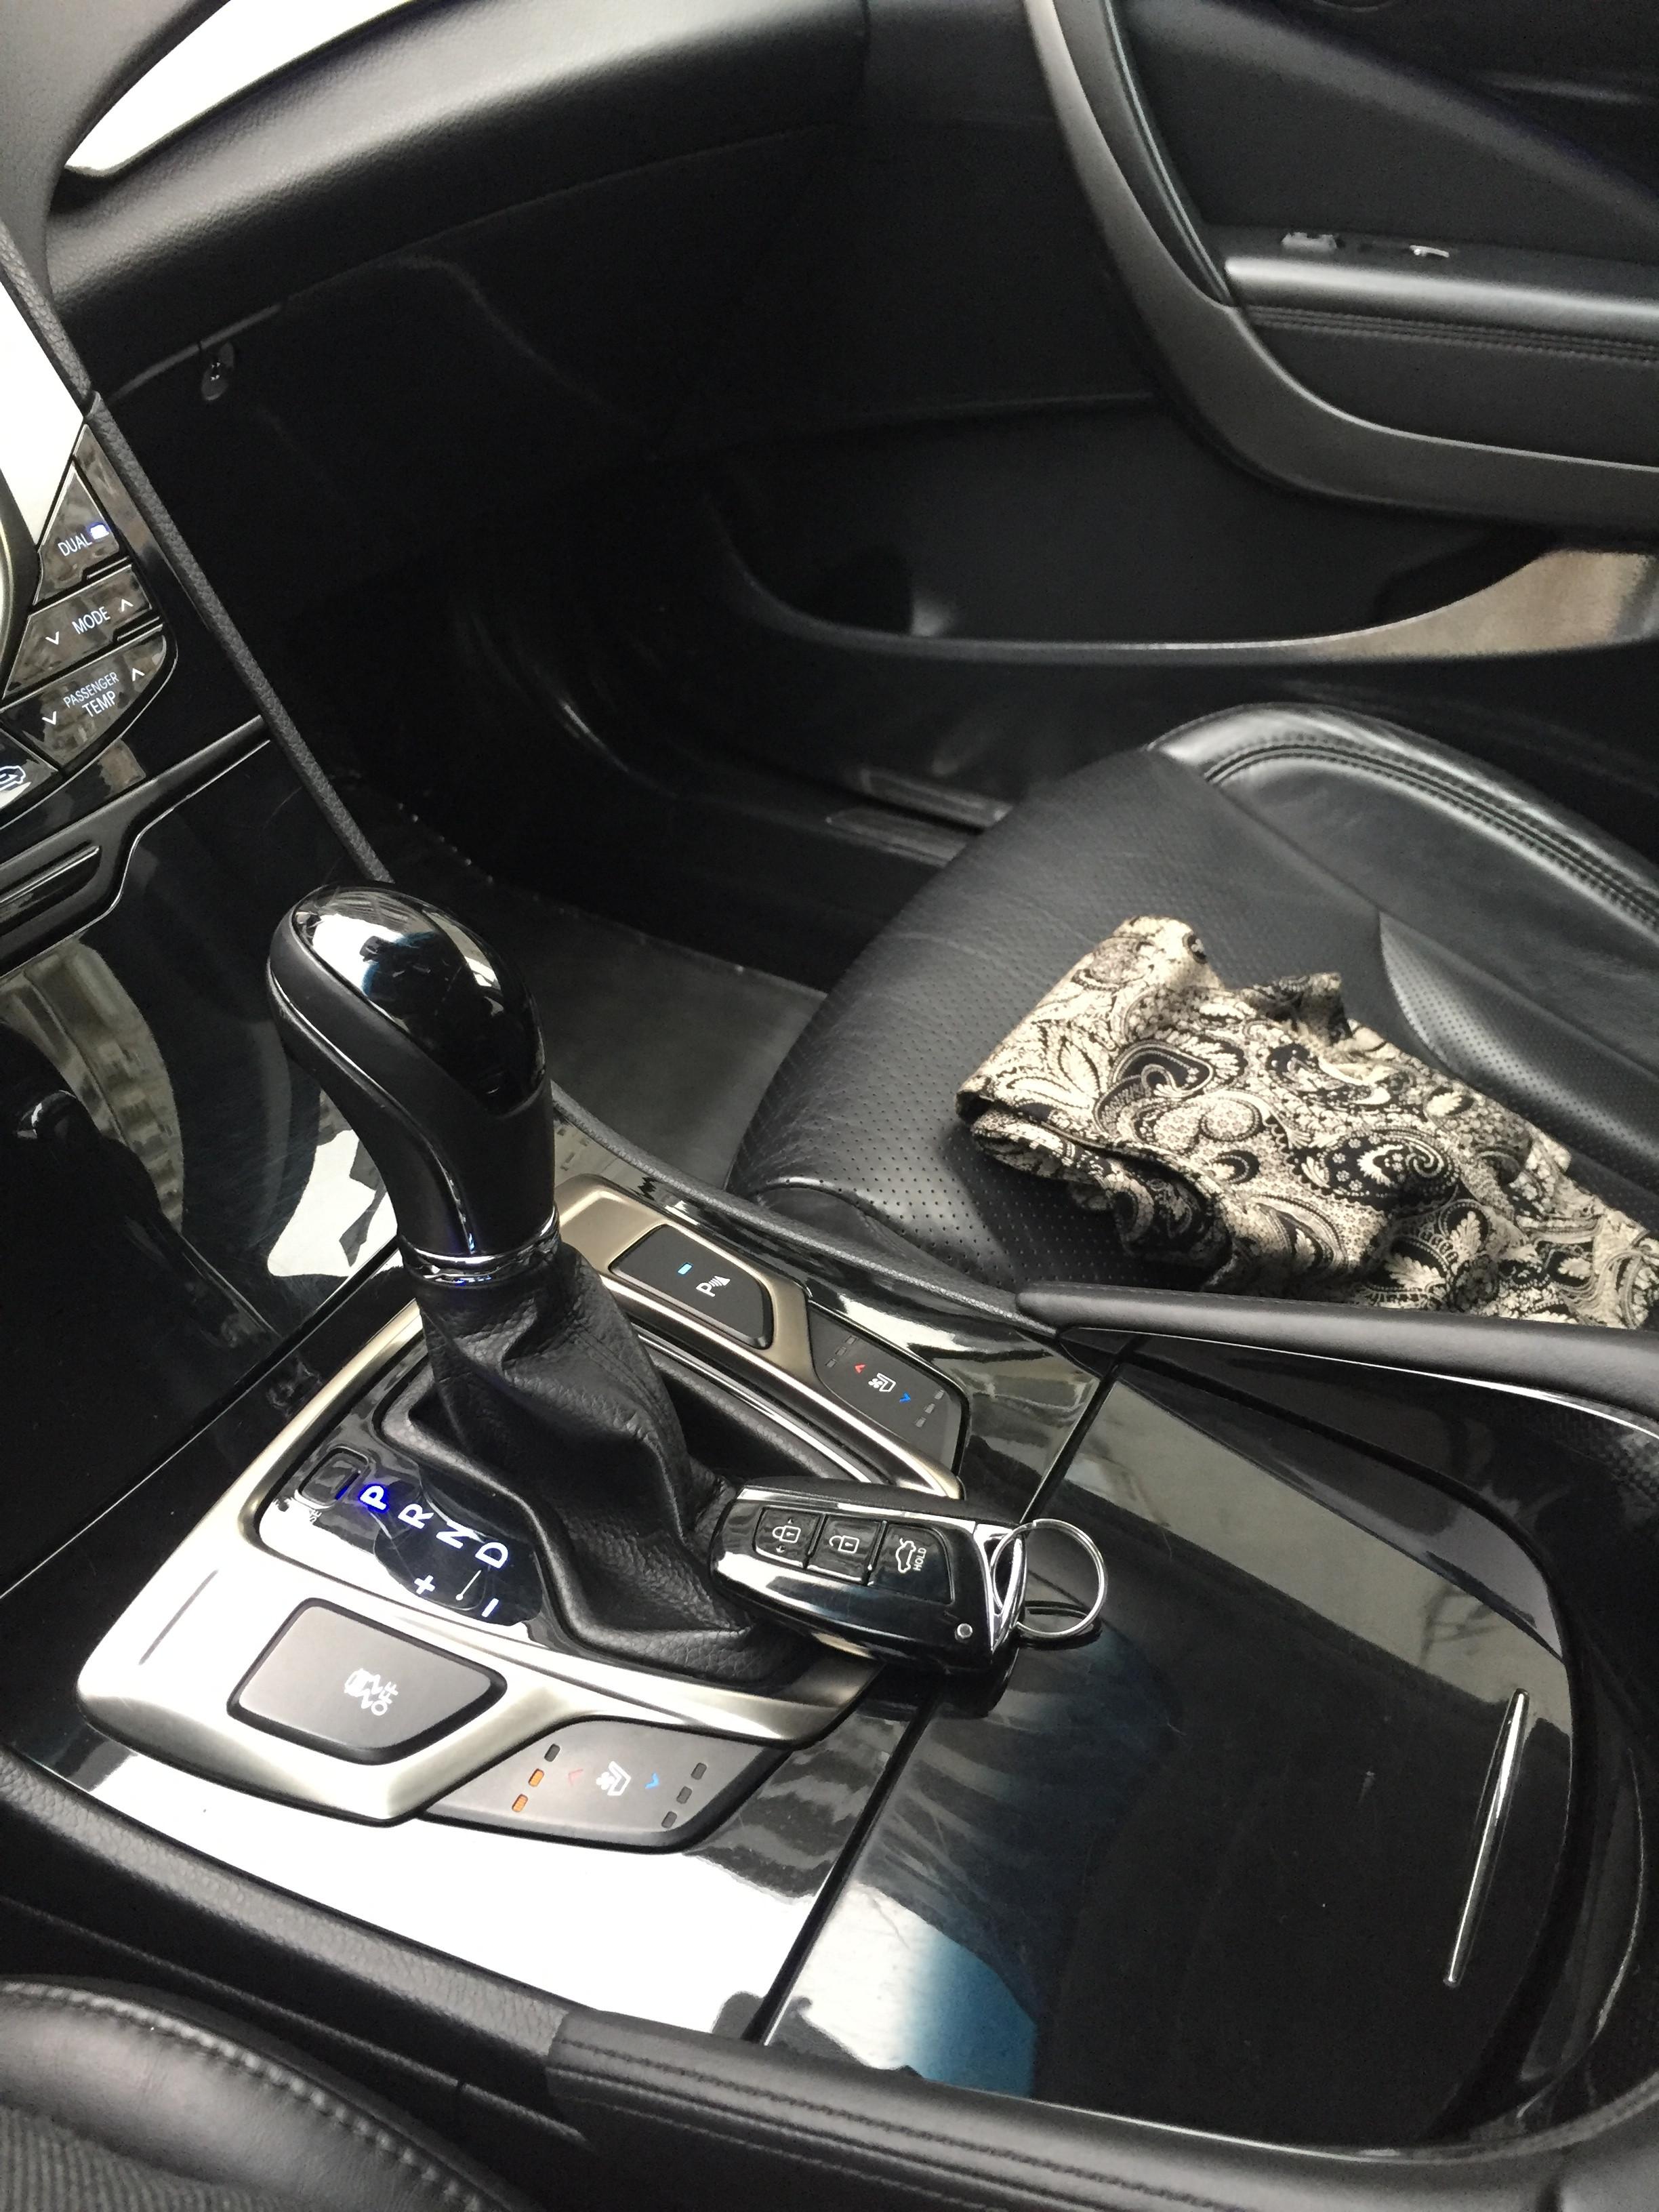 Hyundai Grandeur/Azera 2.4(lt) 2013 İkinci əl  $19000